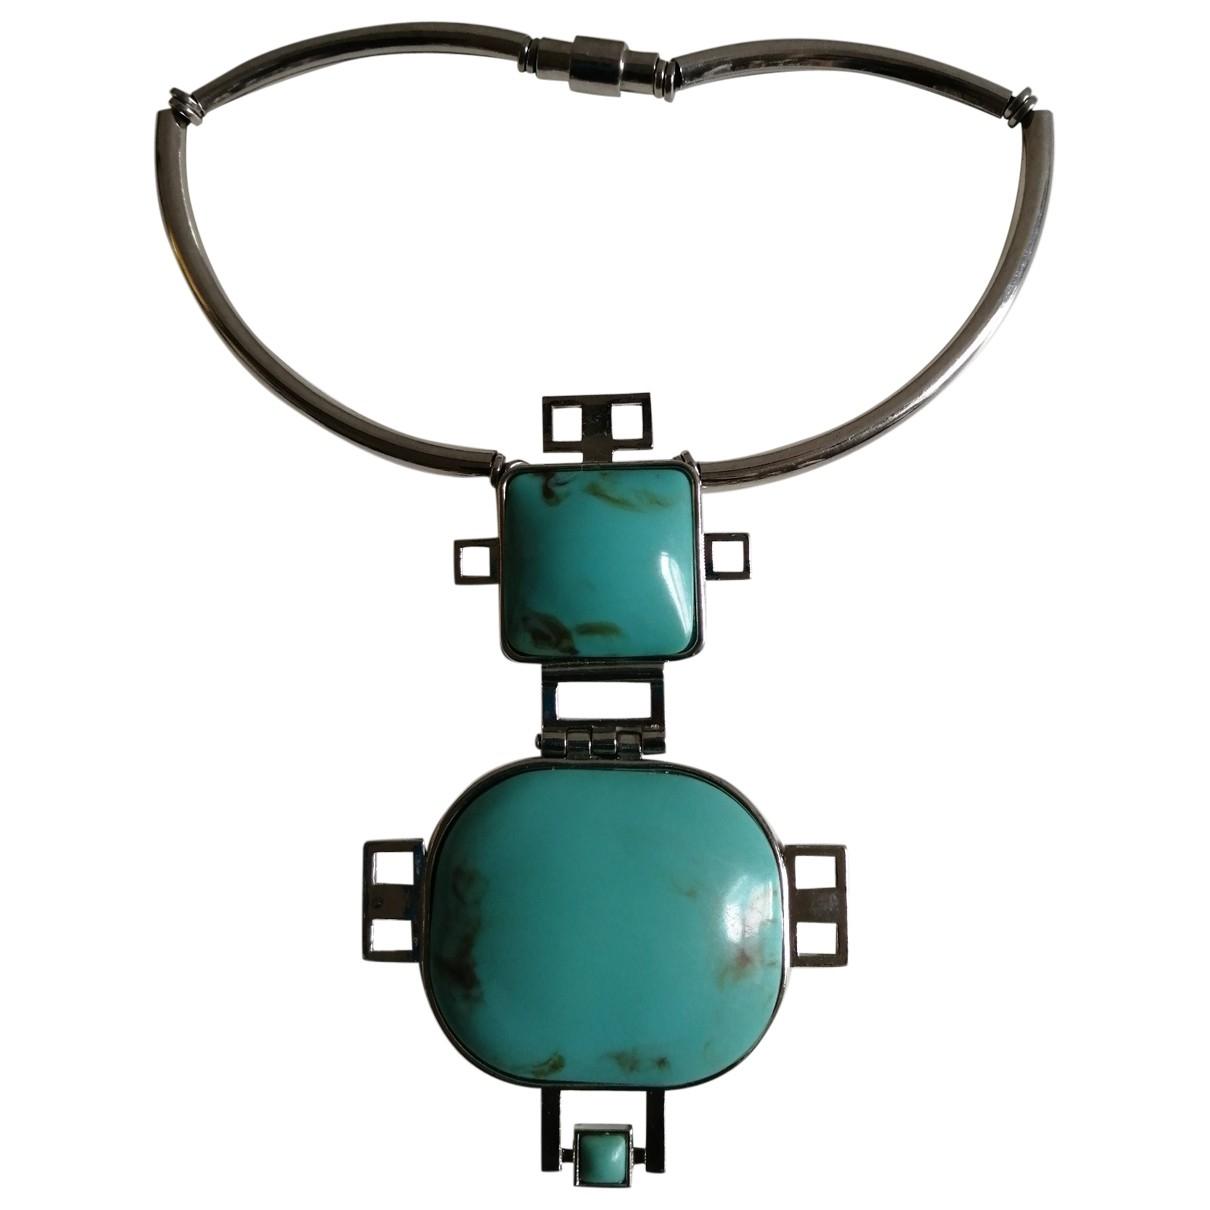 Non Signe / Unsigned Turquoises Kette Bunt